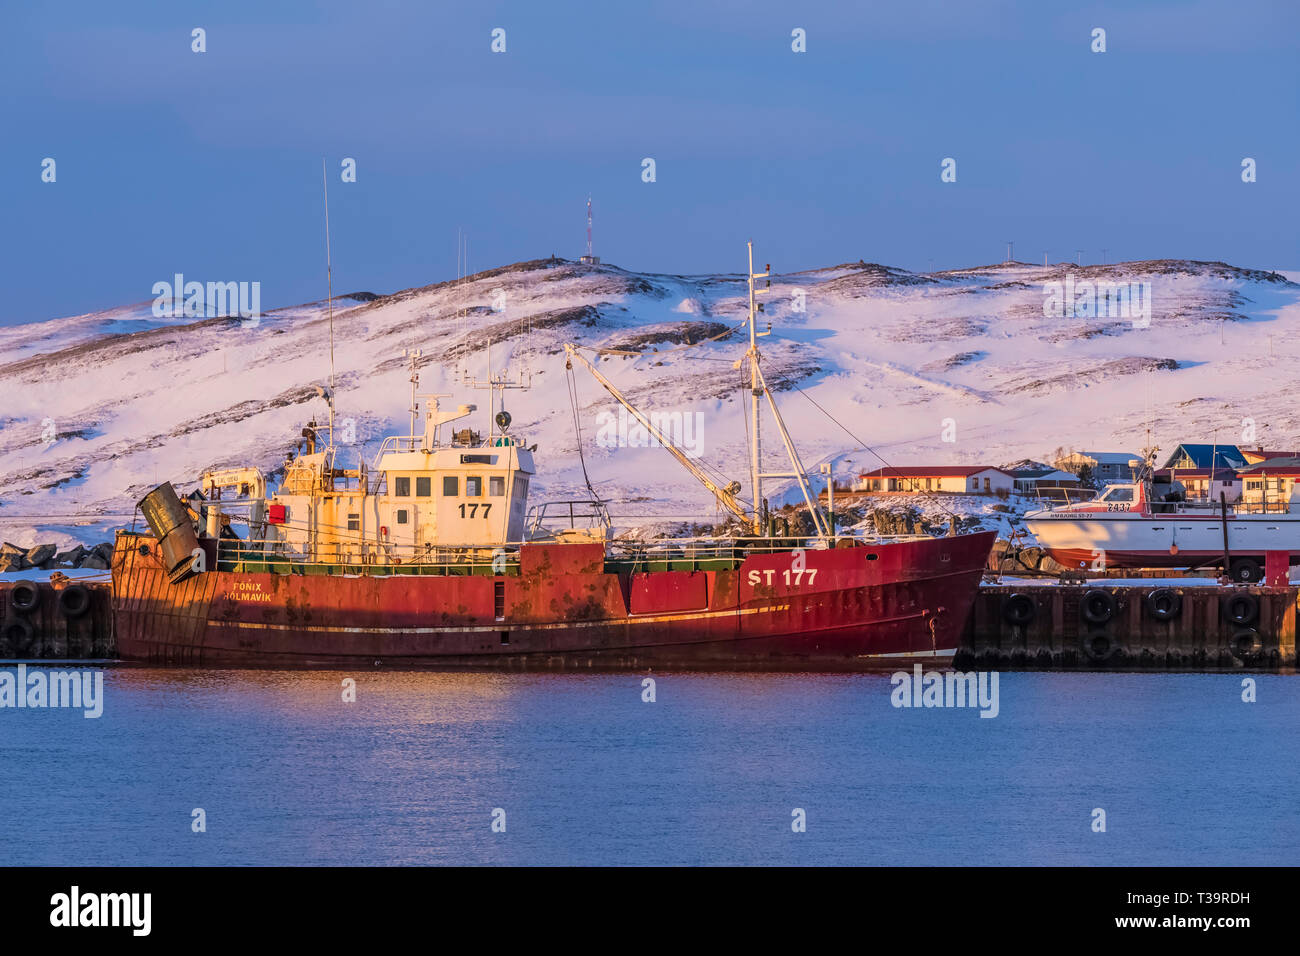 Fonix fishing trawler docked at Hólmavík in winter in the Westfjords